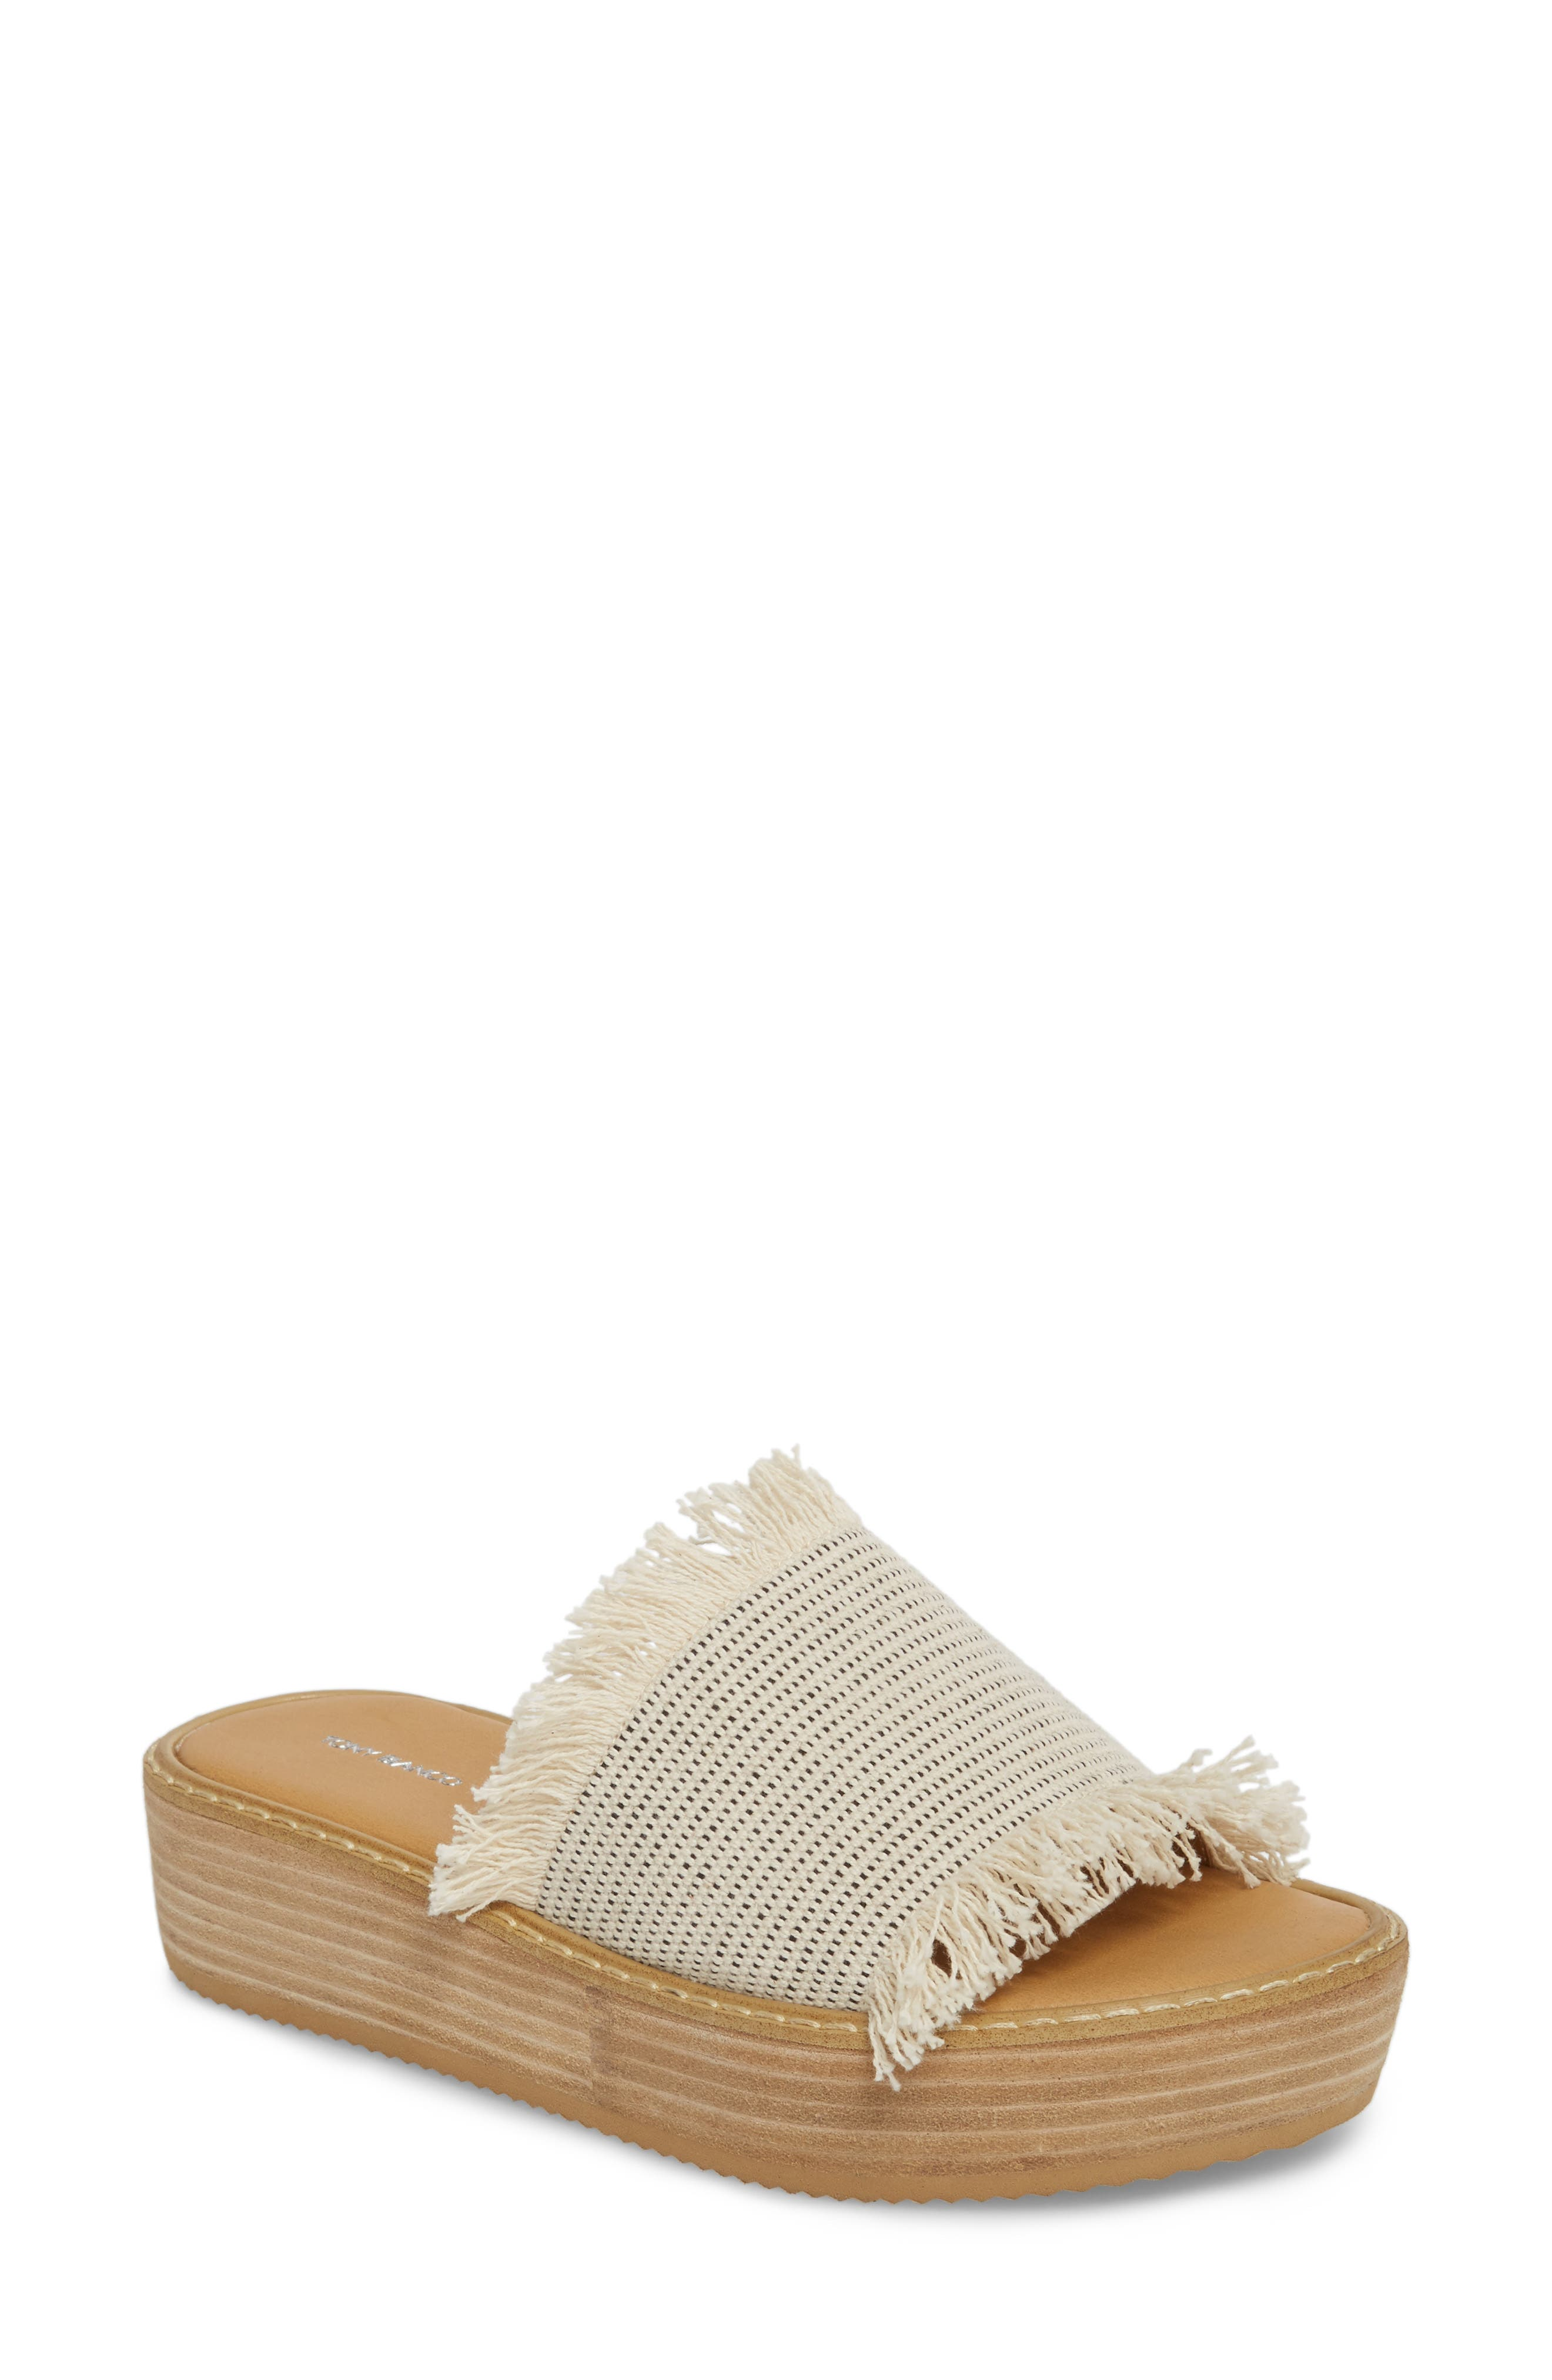 Ebony Platform Sandal,                             Main thumbnail 1, color,                             White/ Black Osaka Fabric